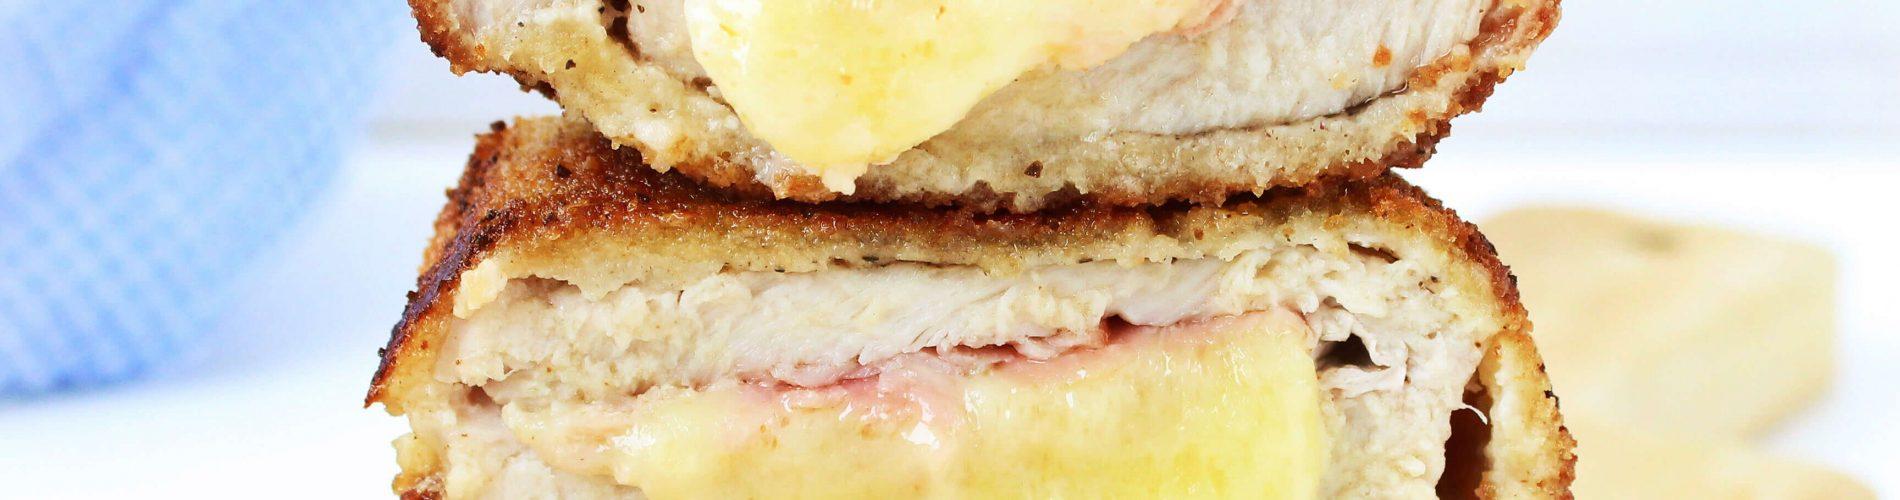 Cordon bleu met Emmentaler kaas